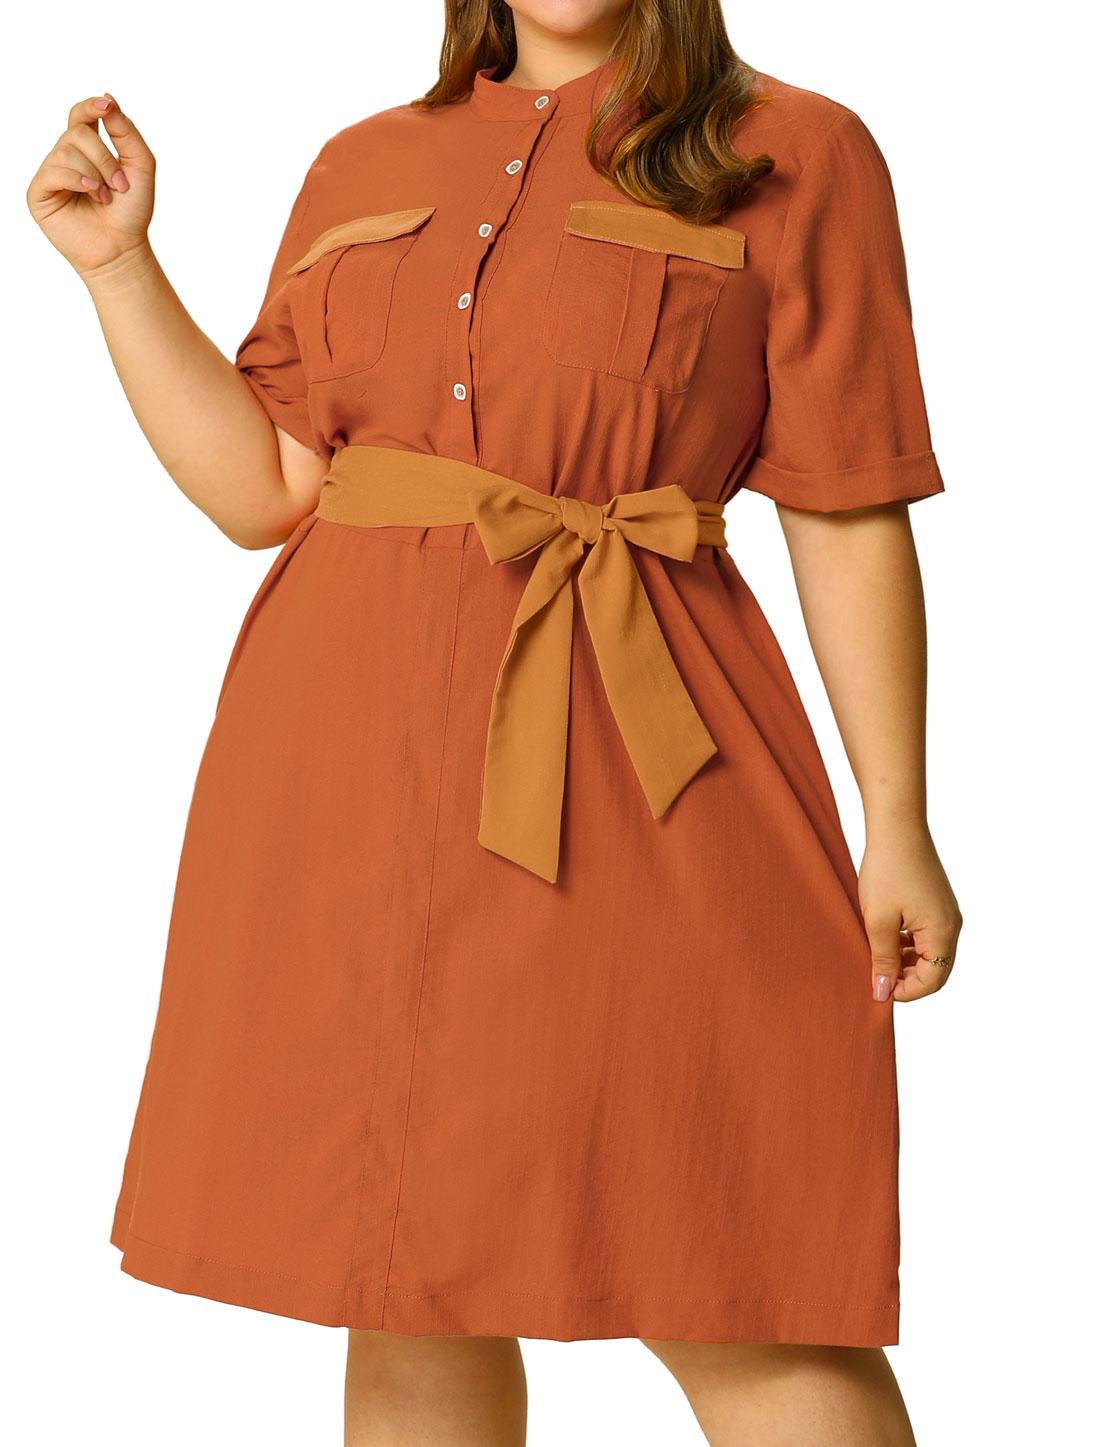 Women's Plus Size Tie Waist Belt Button Down Casual Midi Shirt Dress Orange 3X